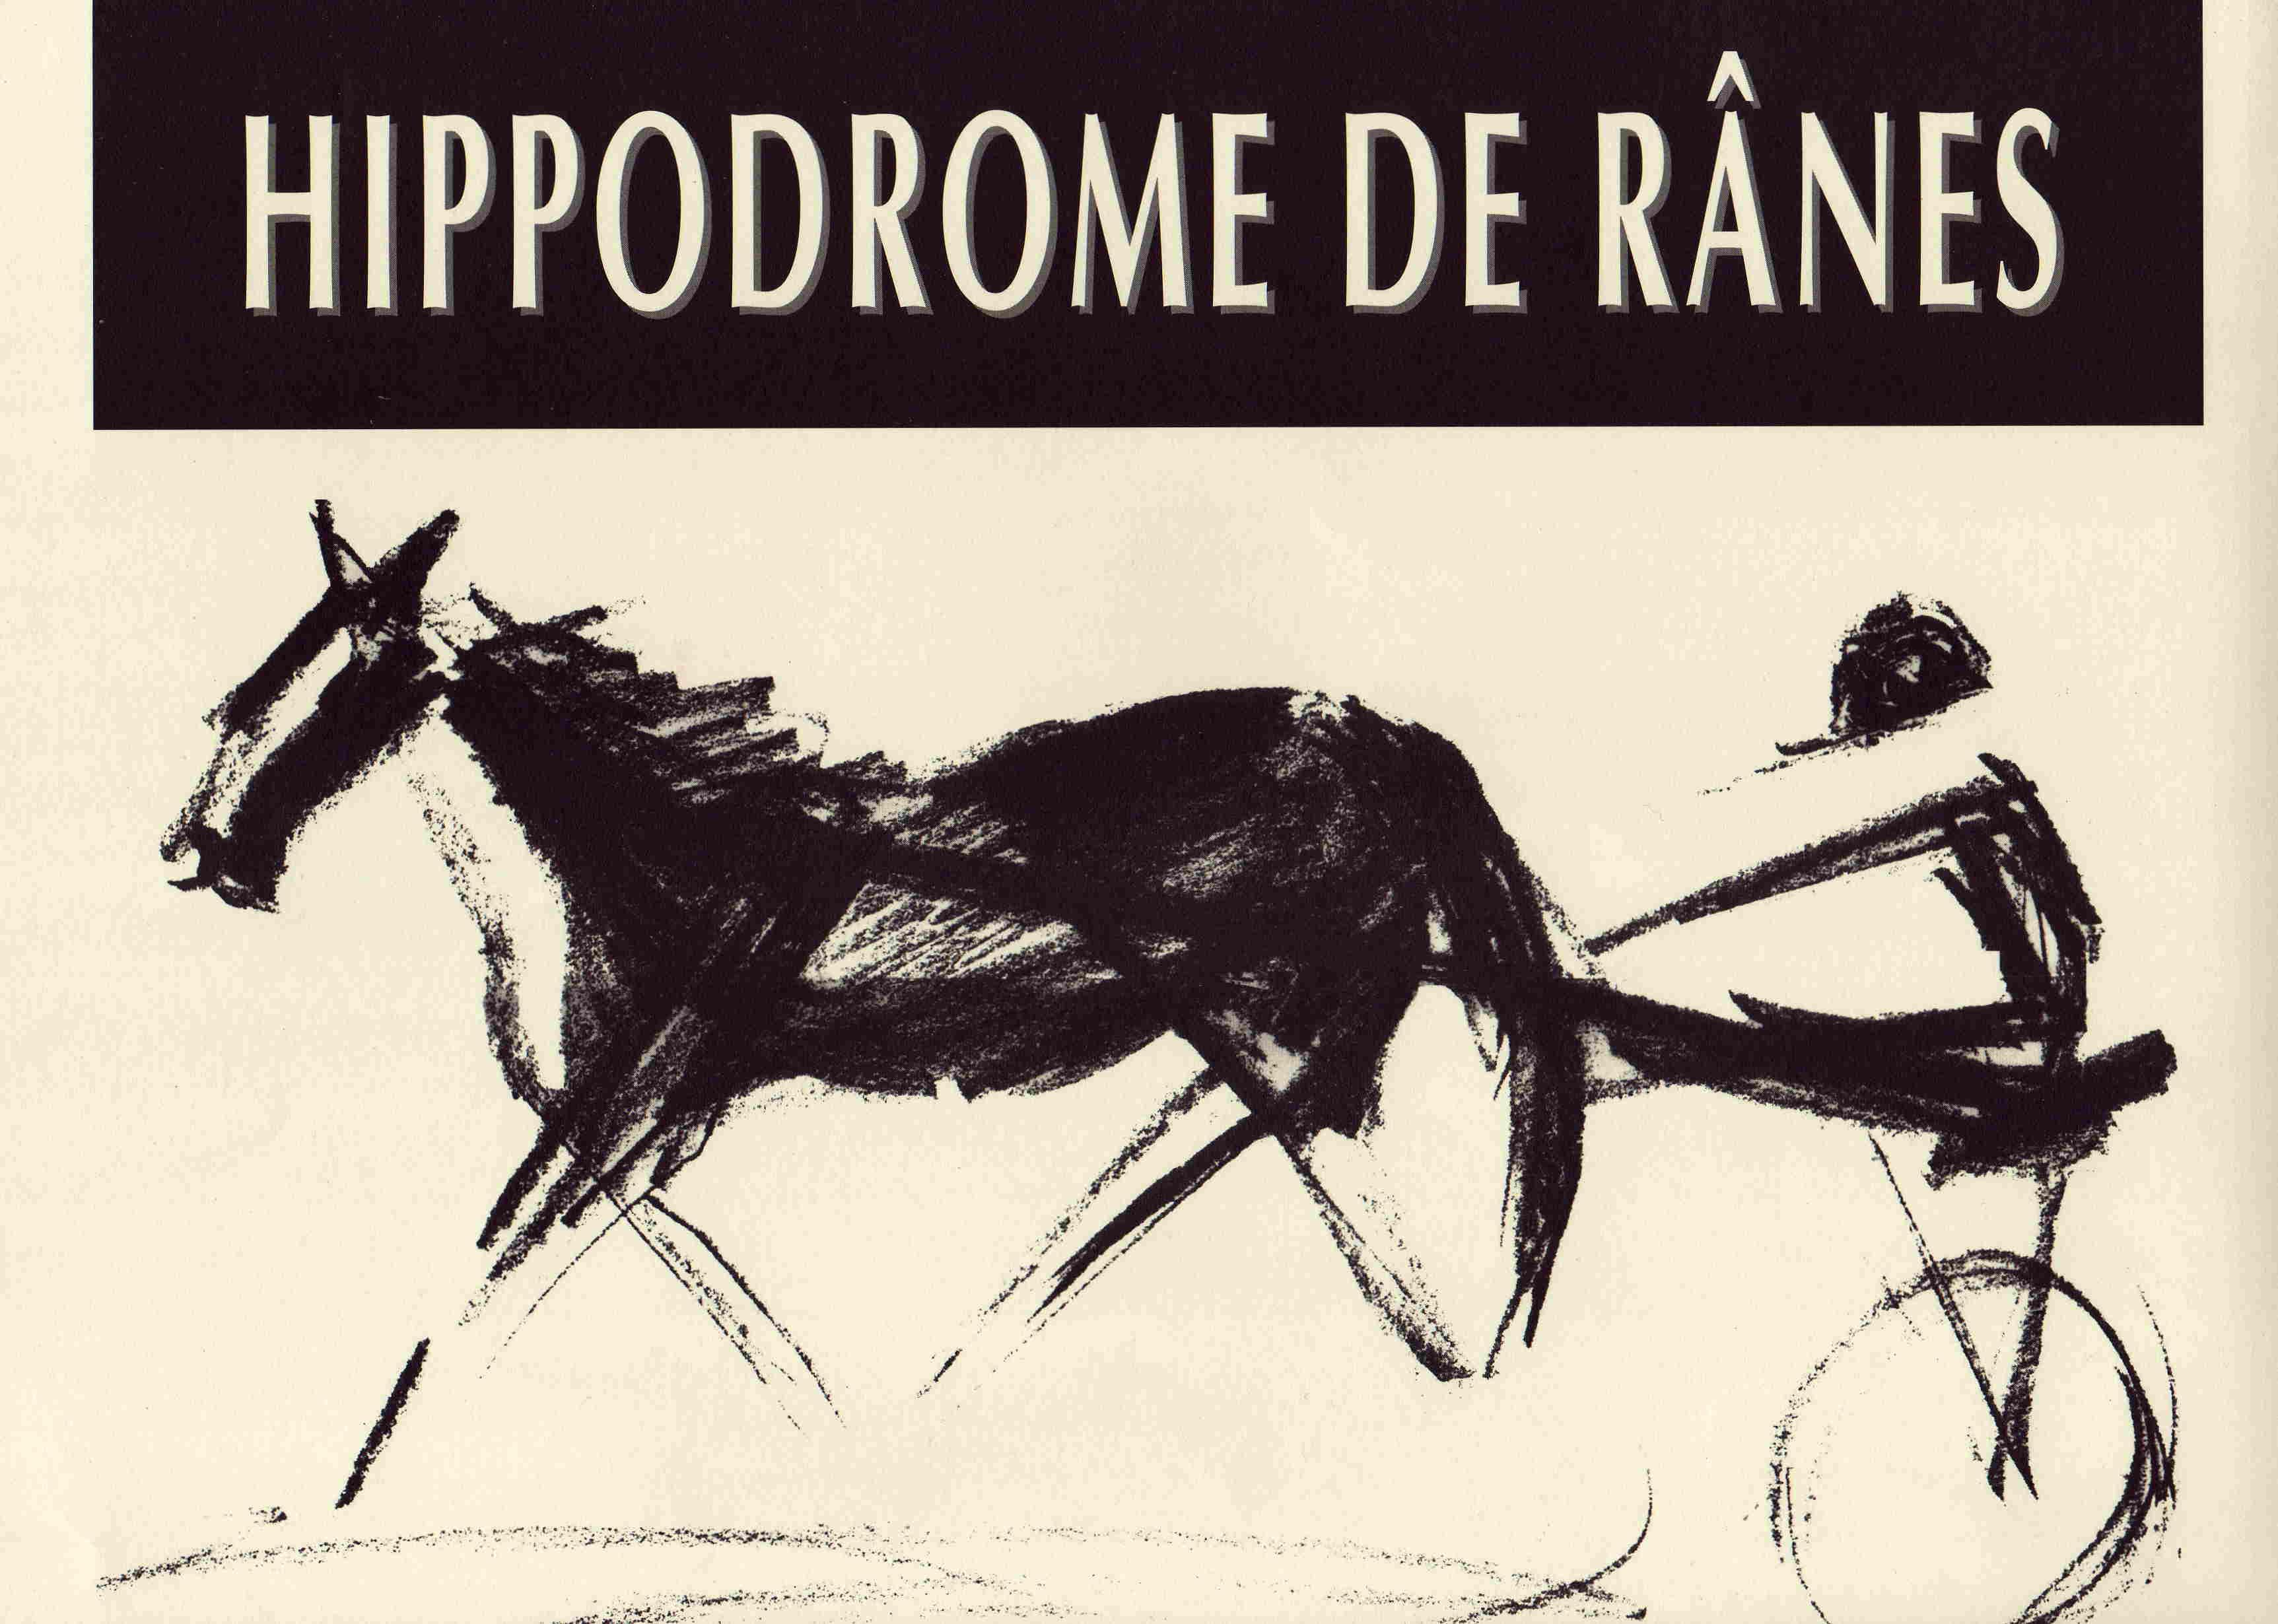 Courses de Rânes - Hippodrome